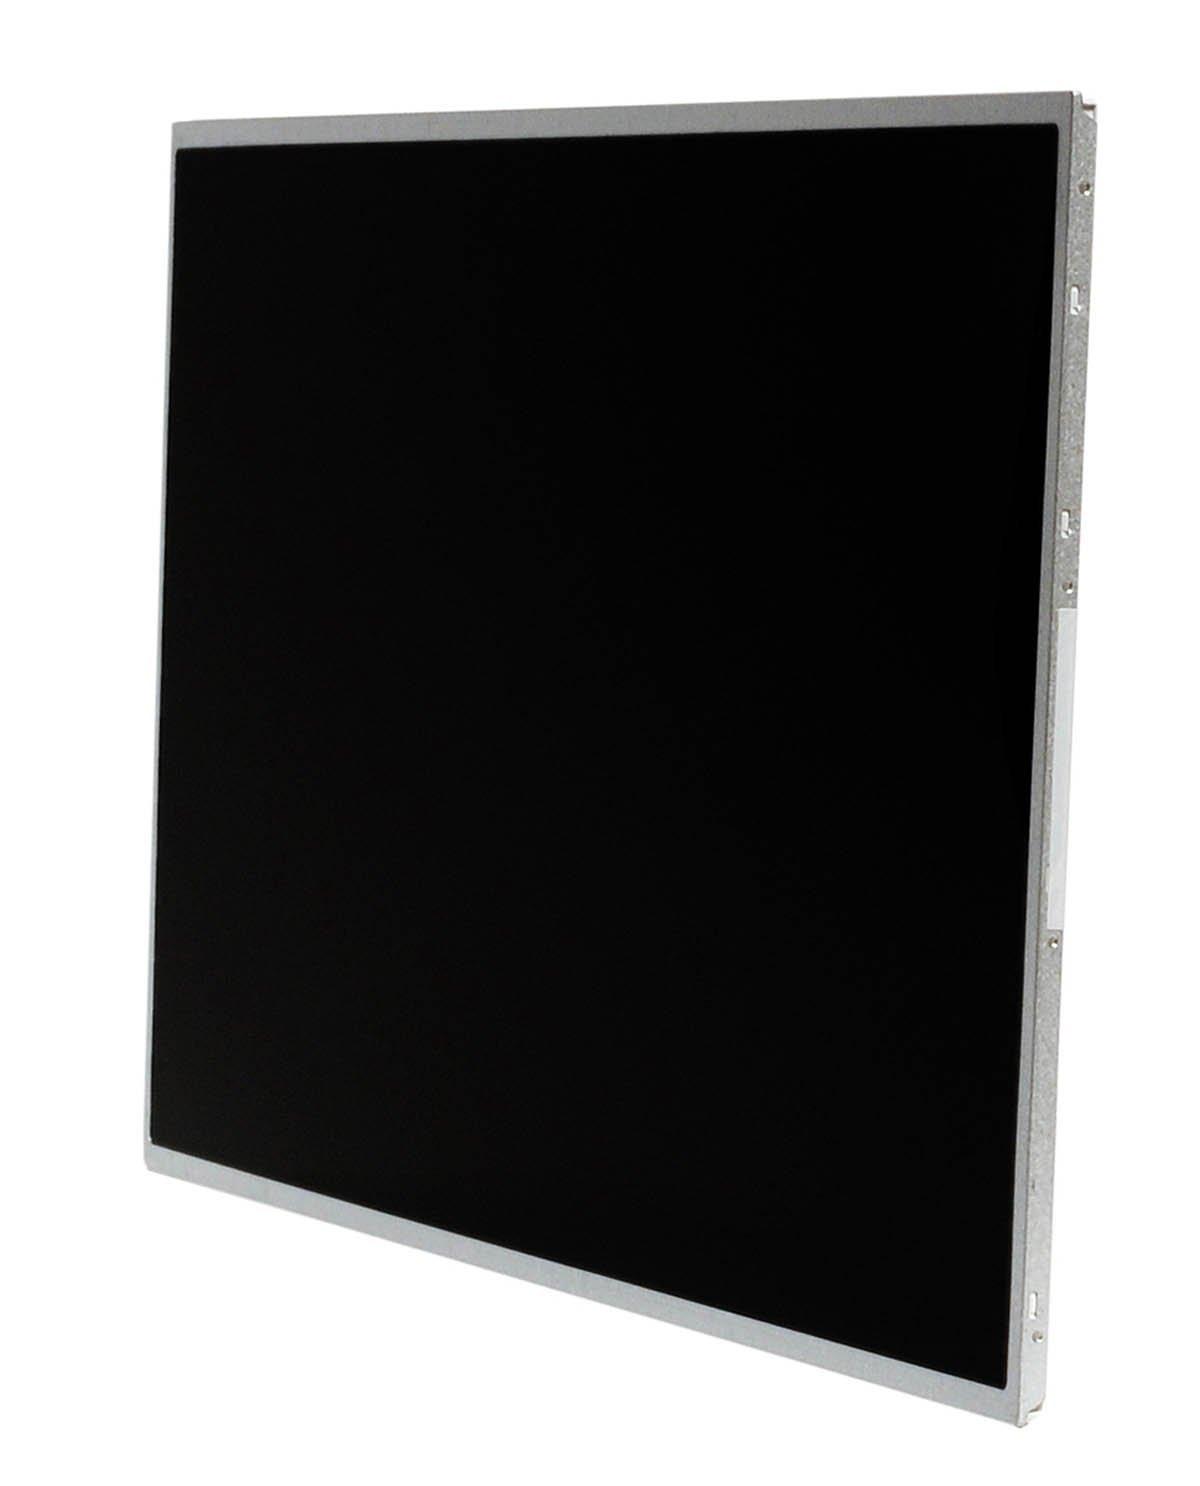 NEW 15.6 inch LED HD LCD RAZOR THIN SCREEN GLOSSY for ASUS K56CB